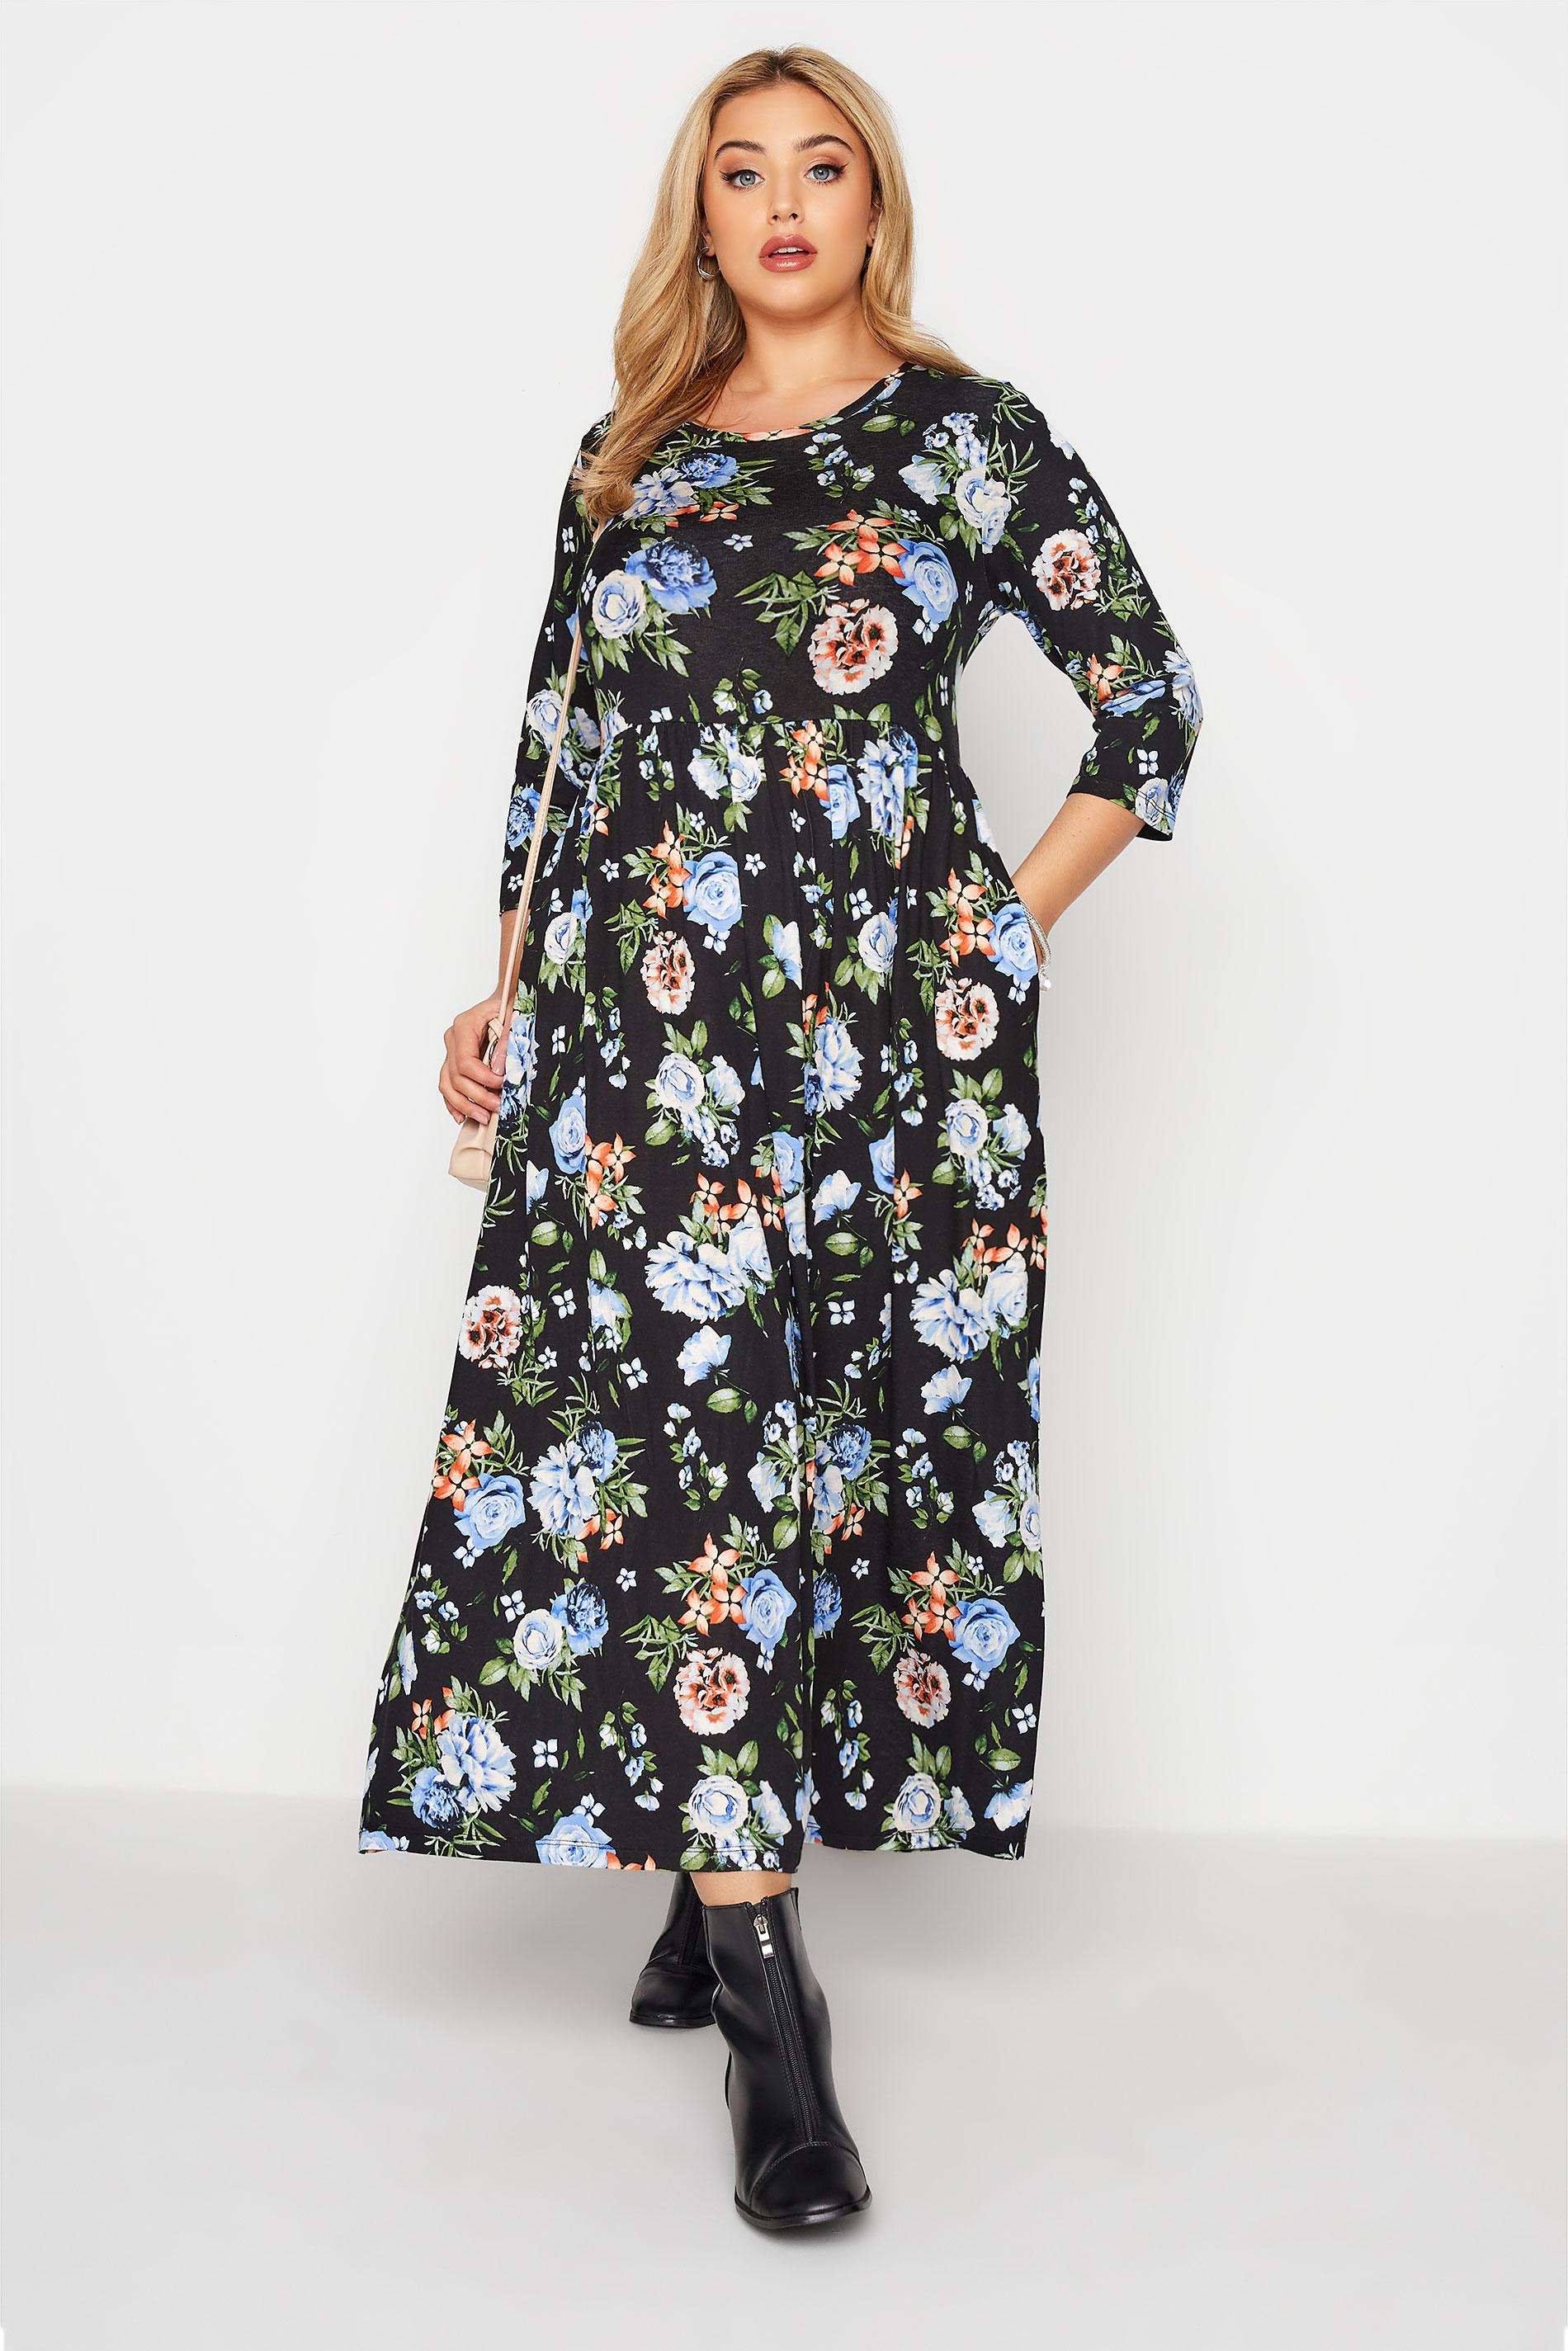 Black Pocket Floral Midaxi Dress_B.jpg